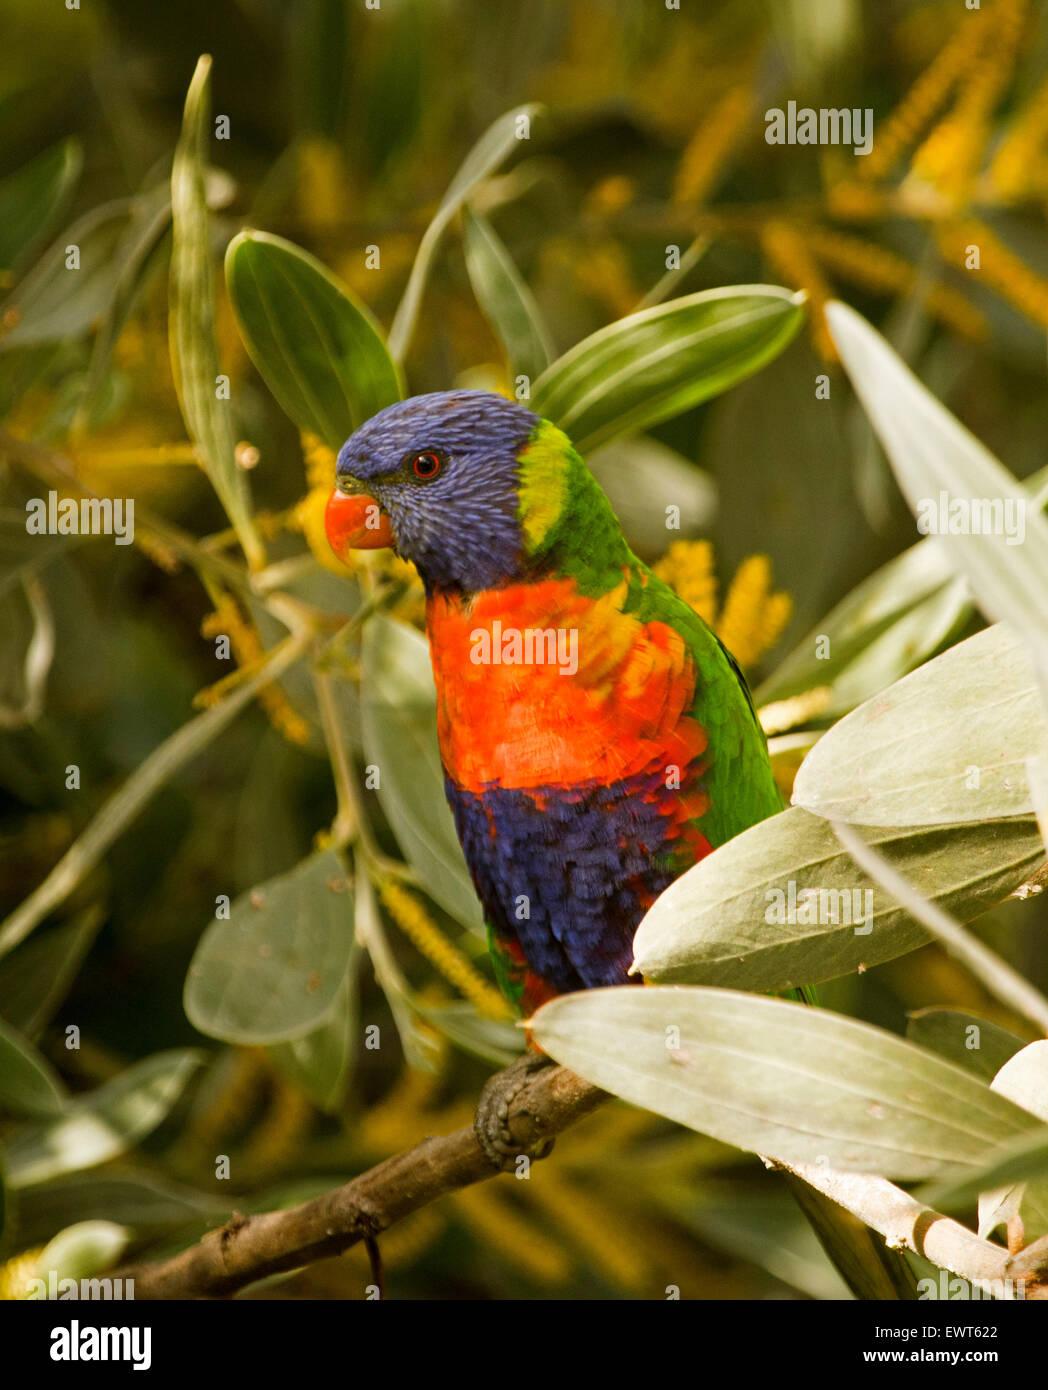 Rainbow lorikeet, Trichoglossus haematodus colourful Australian parrot among flowers and foliage of velvet wattle Stock Photo